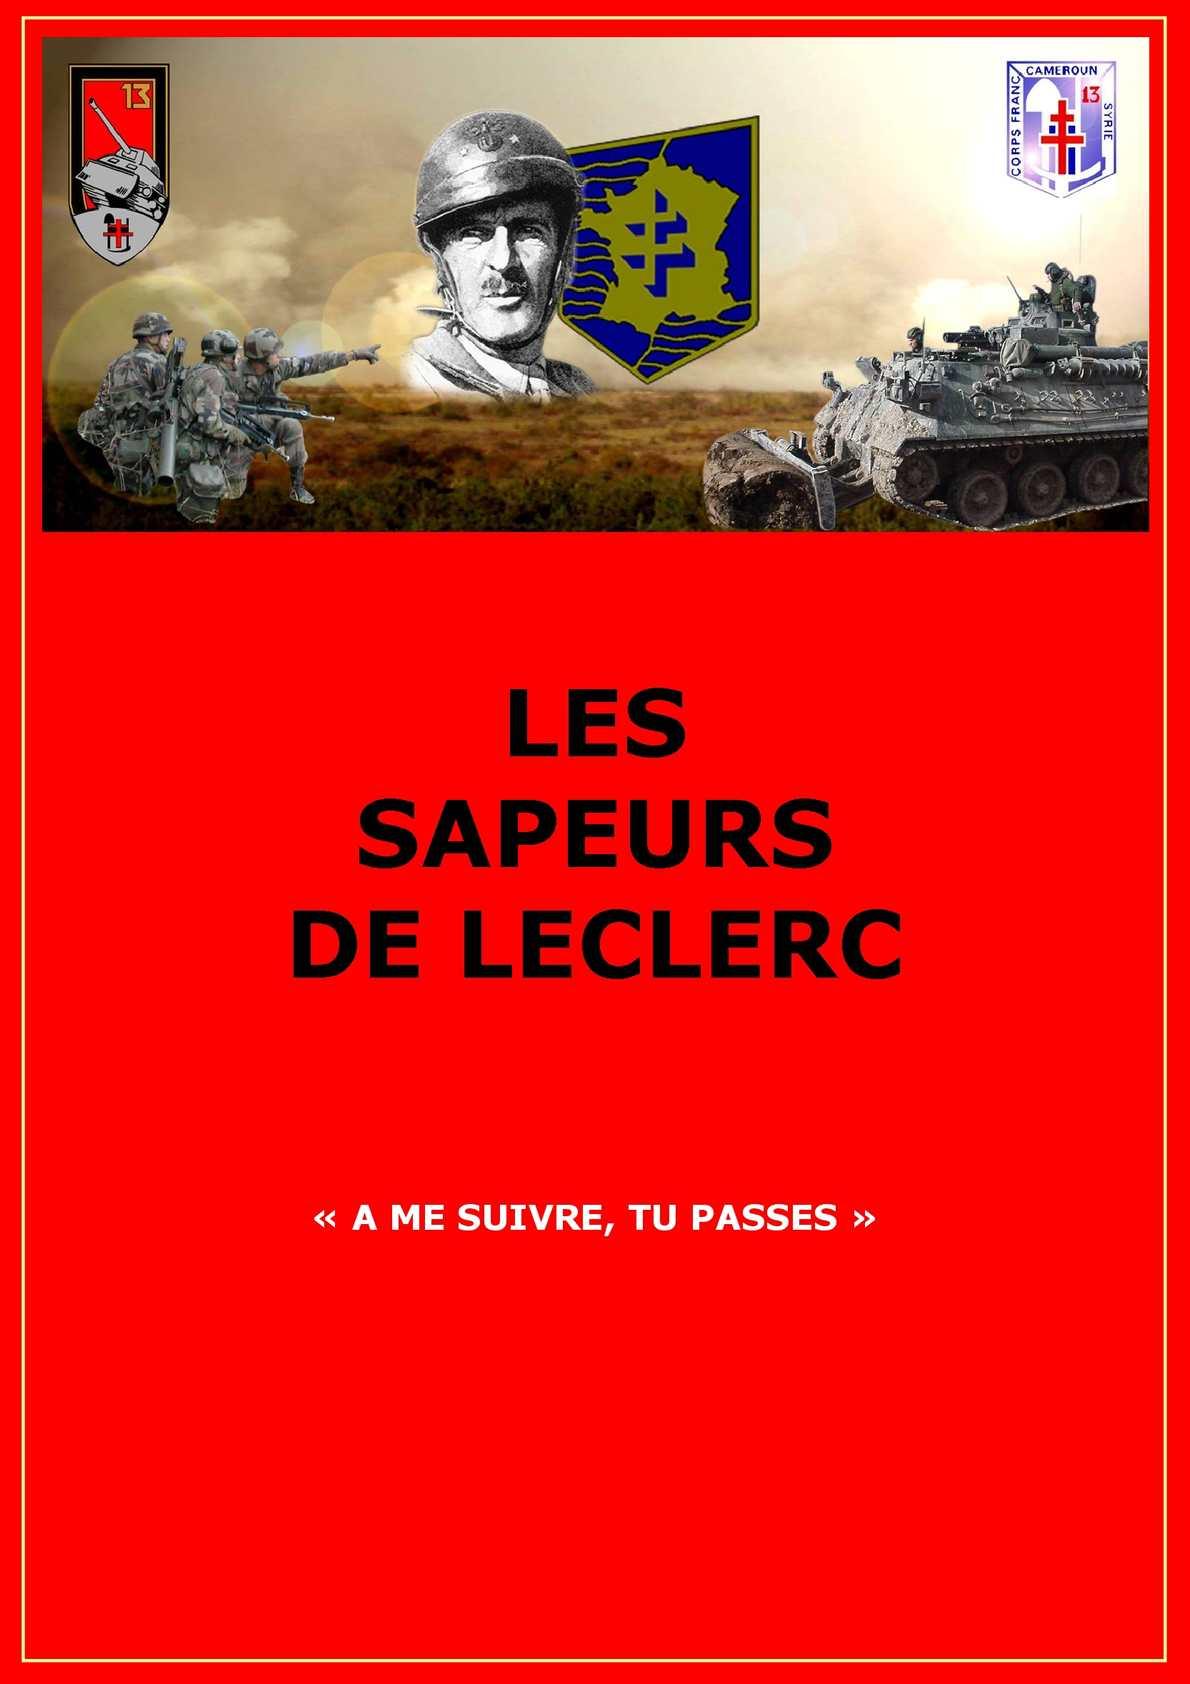 Sapeurs Calaméo Calaméo Leclerc De Los W2YEDHI9